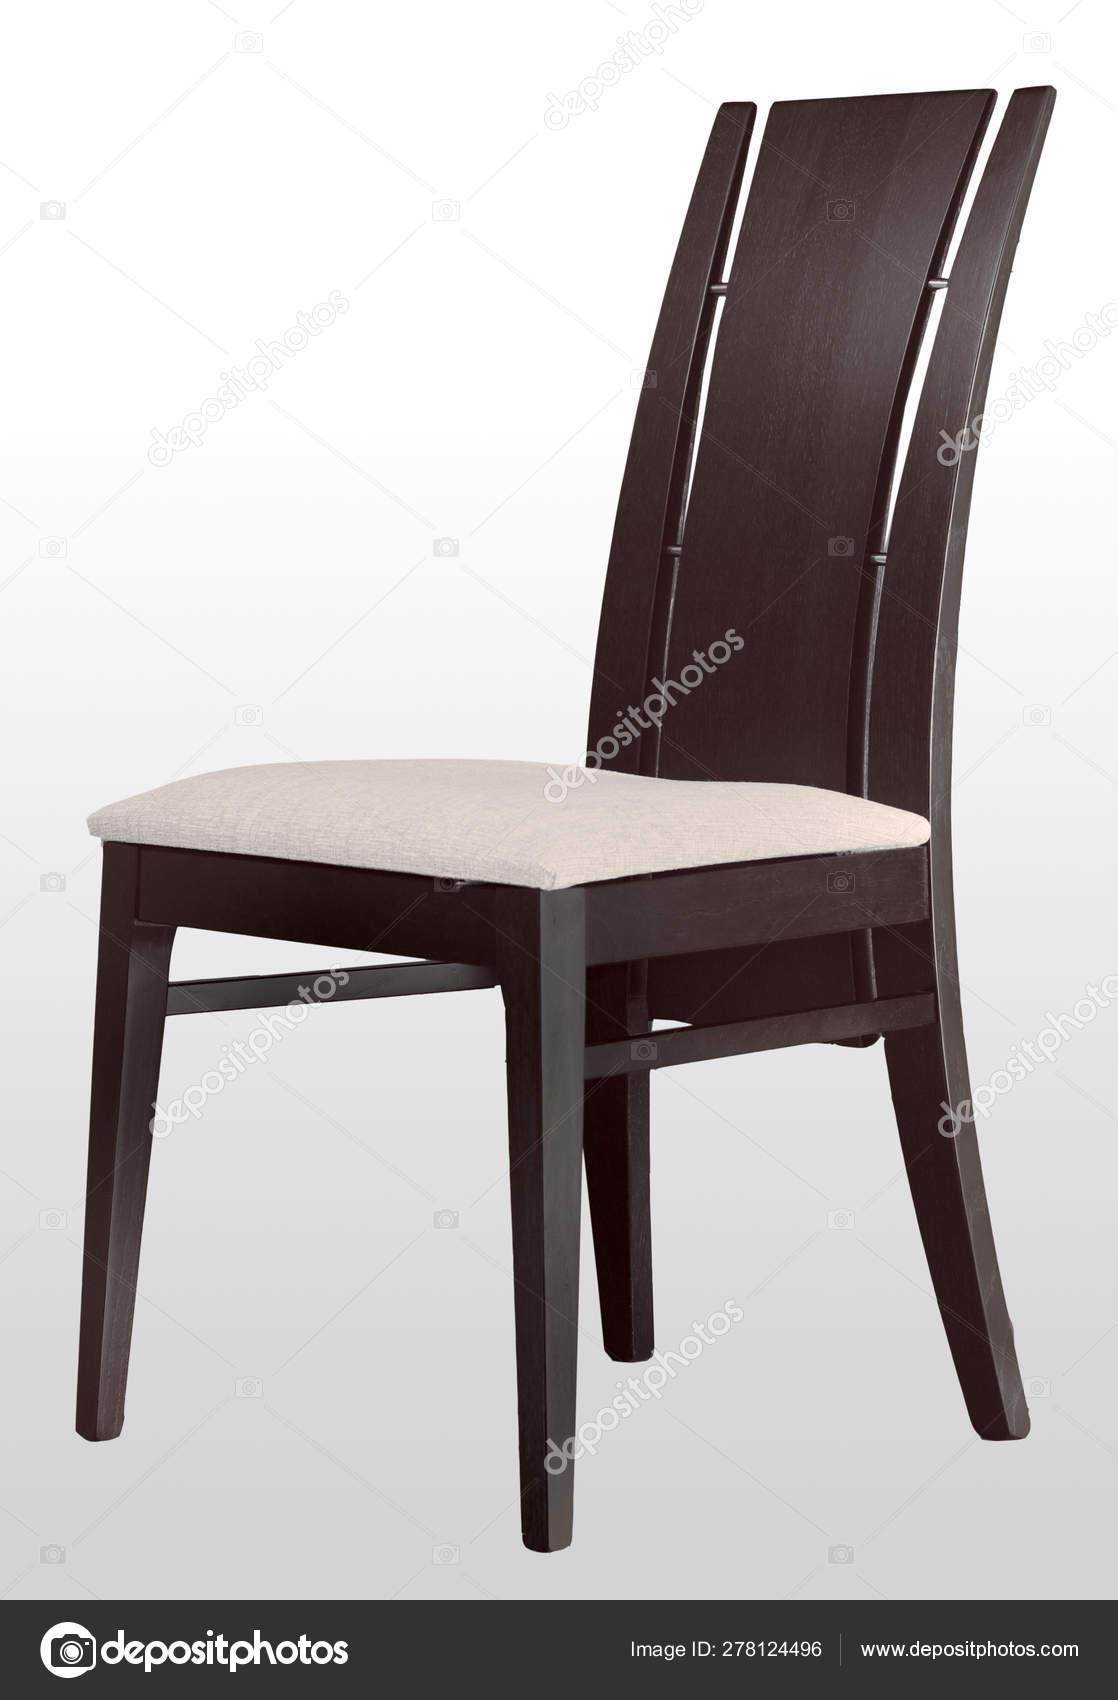 Silla Comedor Madera Aislada Diseño Muebles — Foto de stock ...